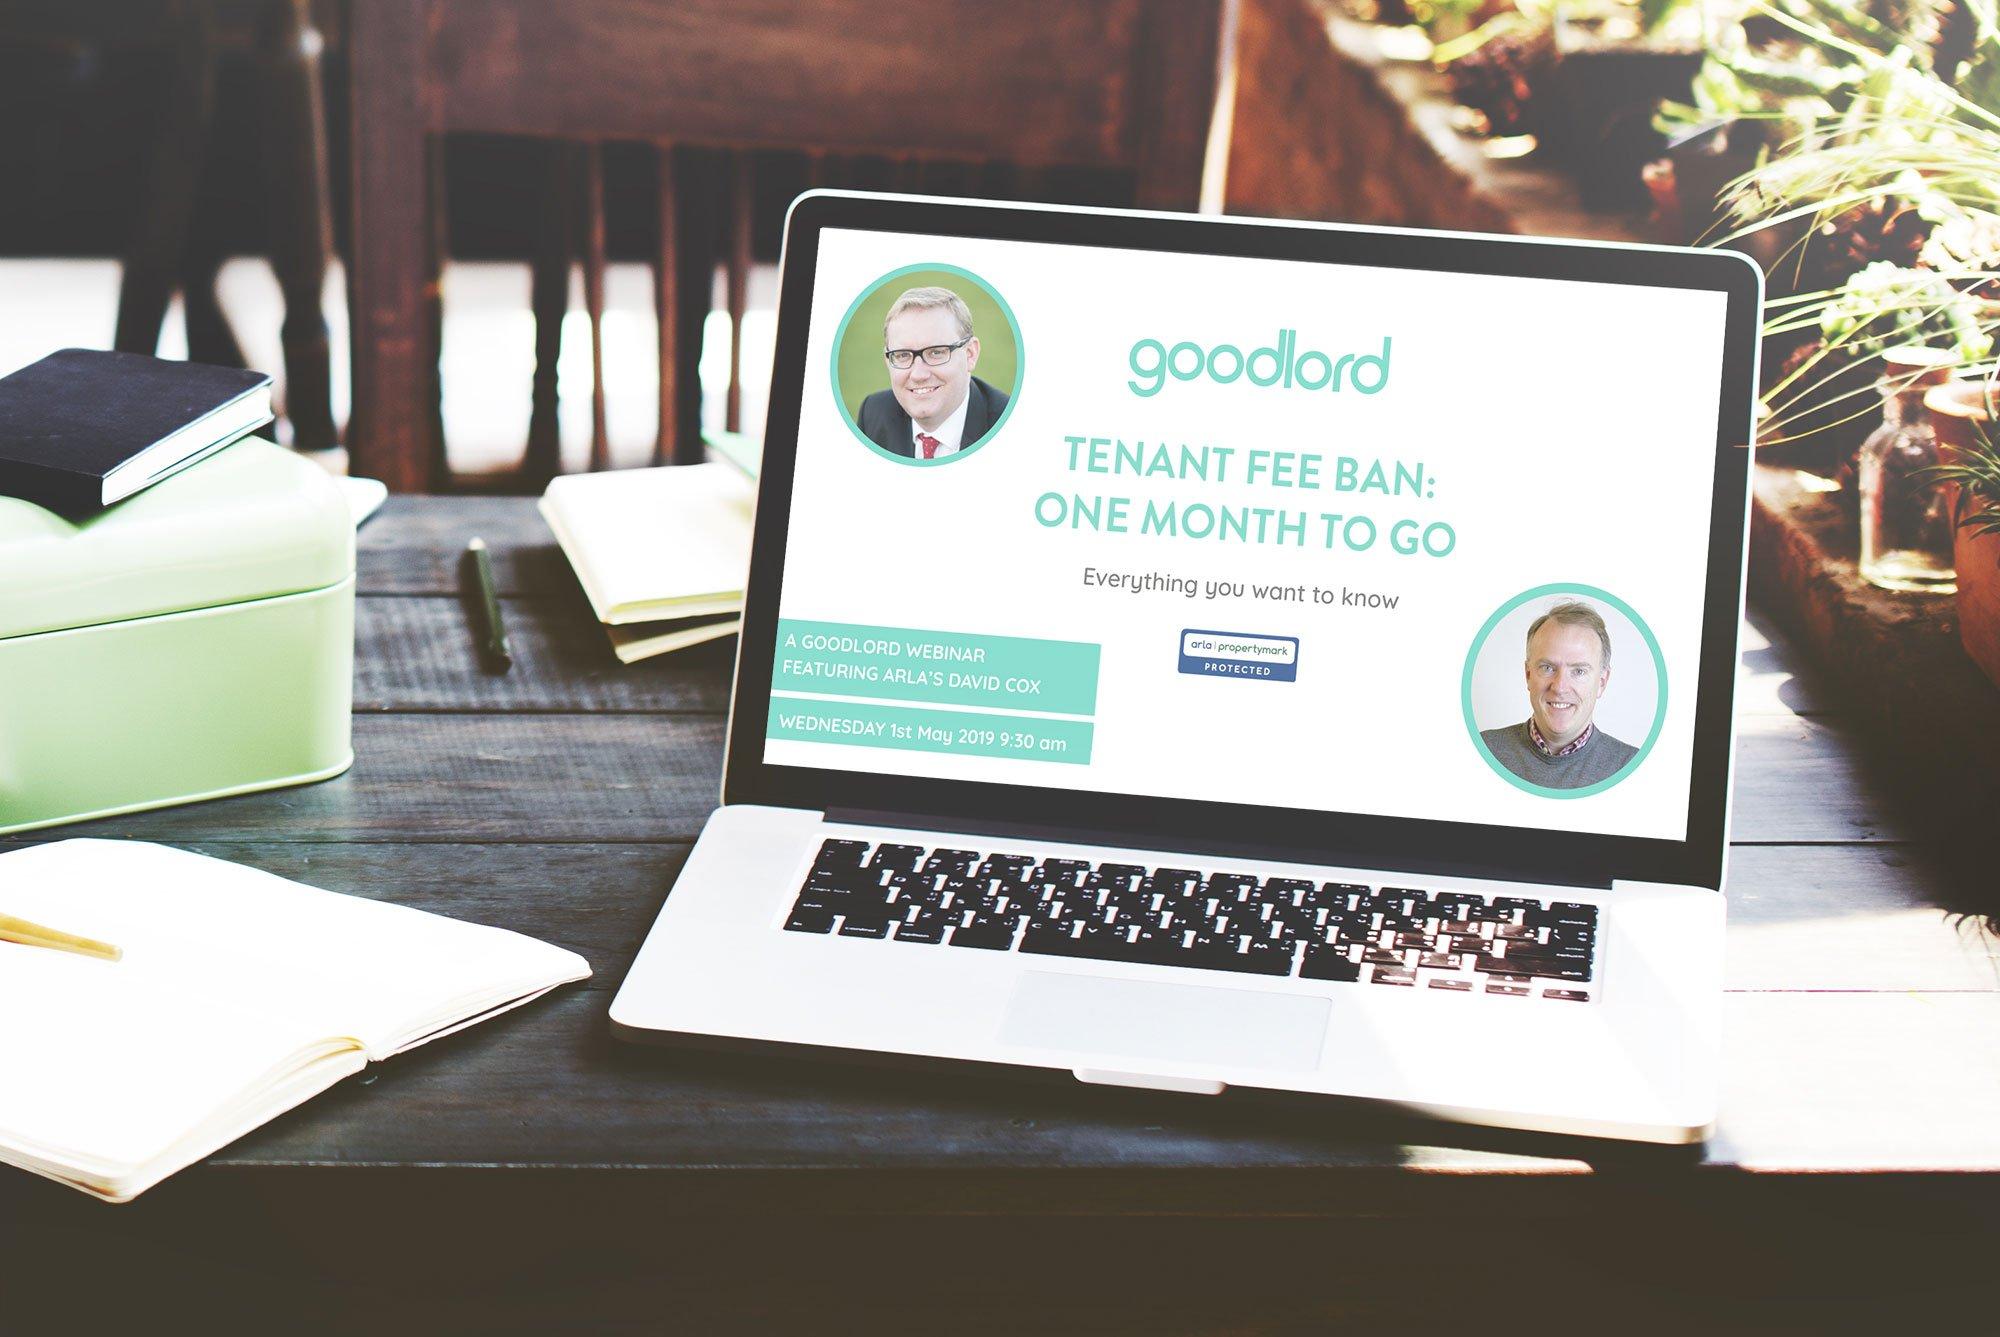 Tenant Fee Ban webinar with ARLA's David Cox